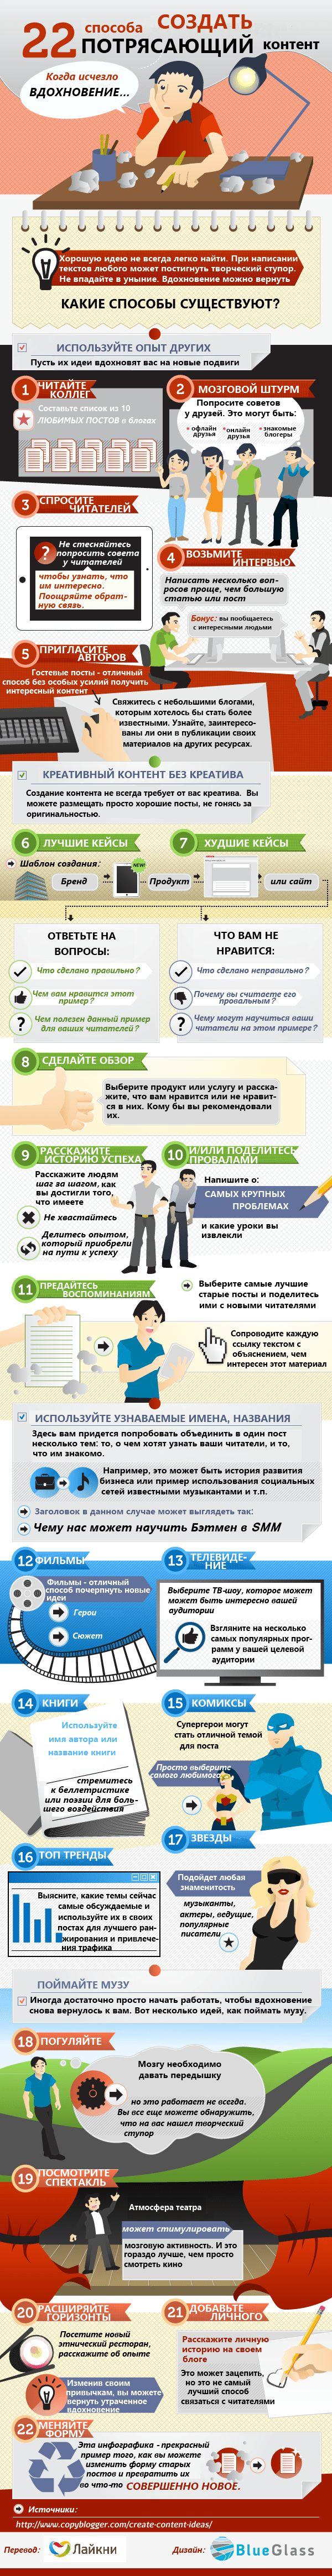 14-primerov-infografiki-po-kontent-marketingu_12